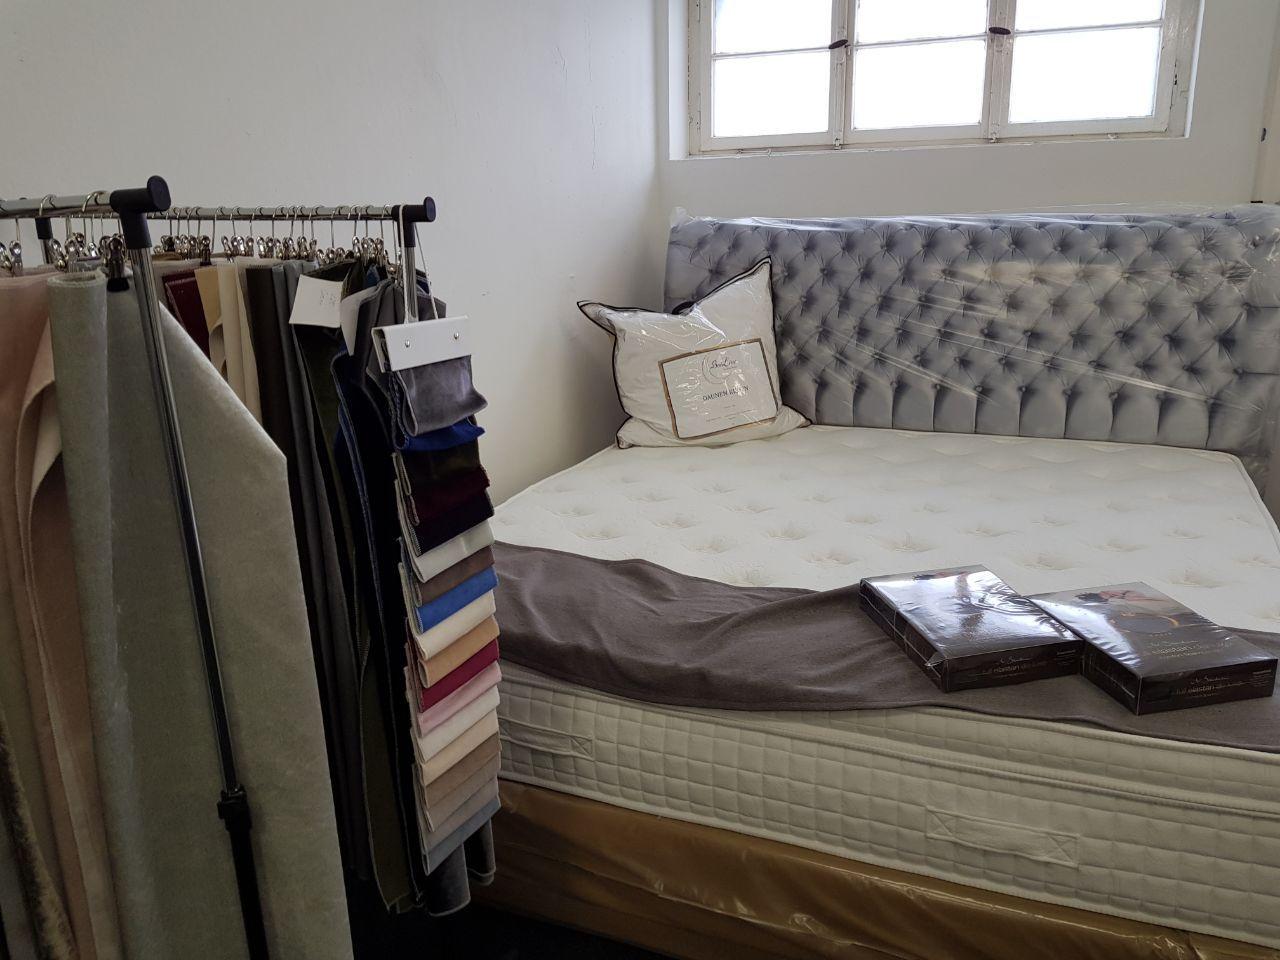 Unsere Stoffe Bett Matratze Stoffe